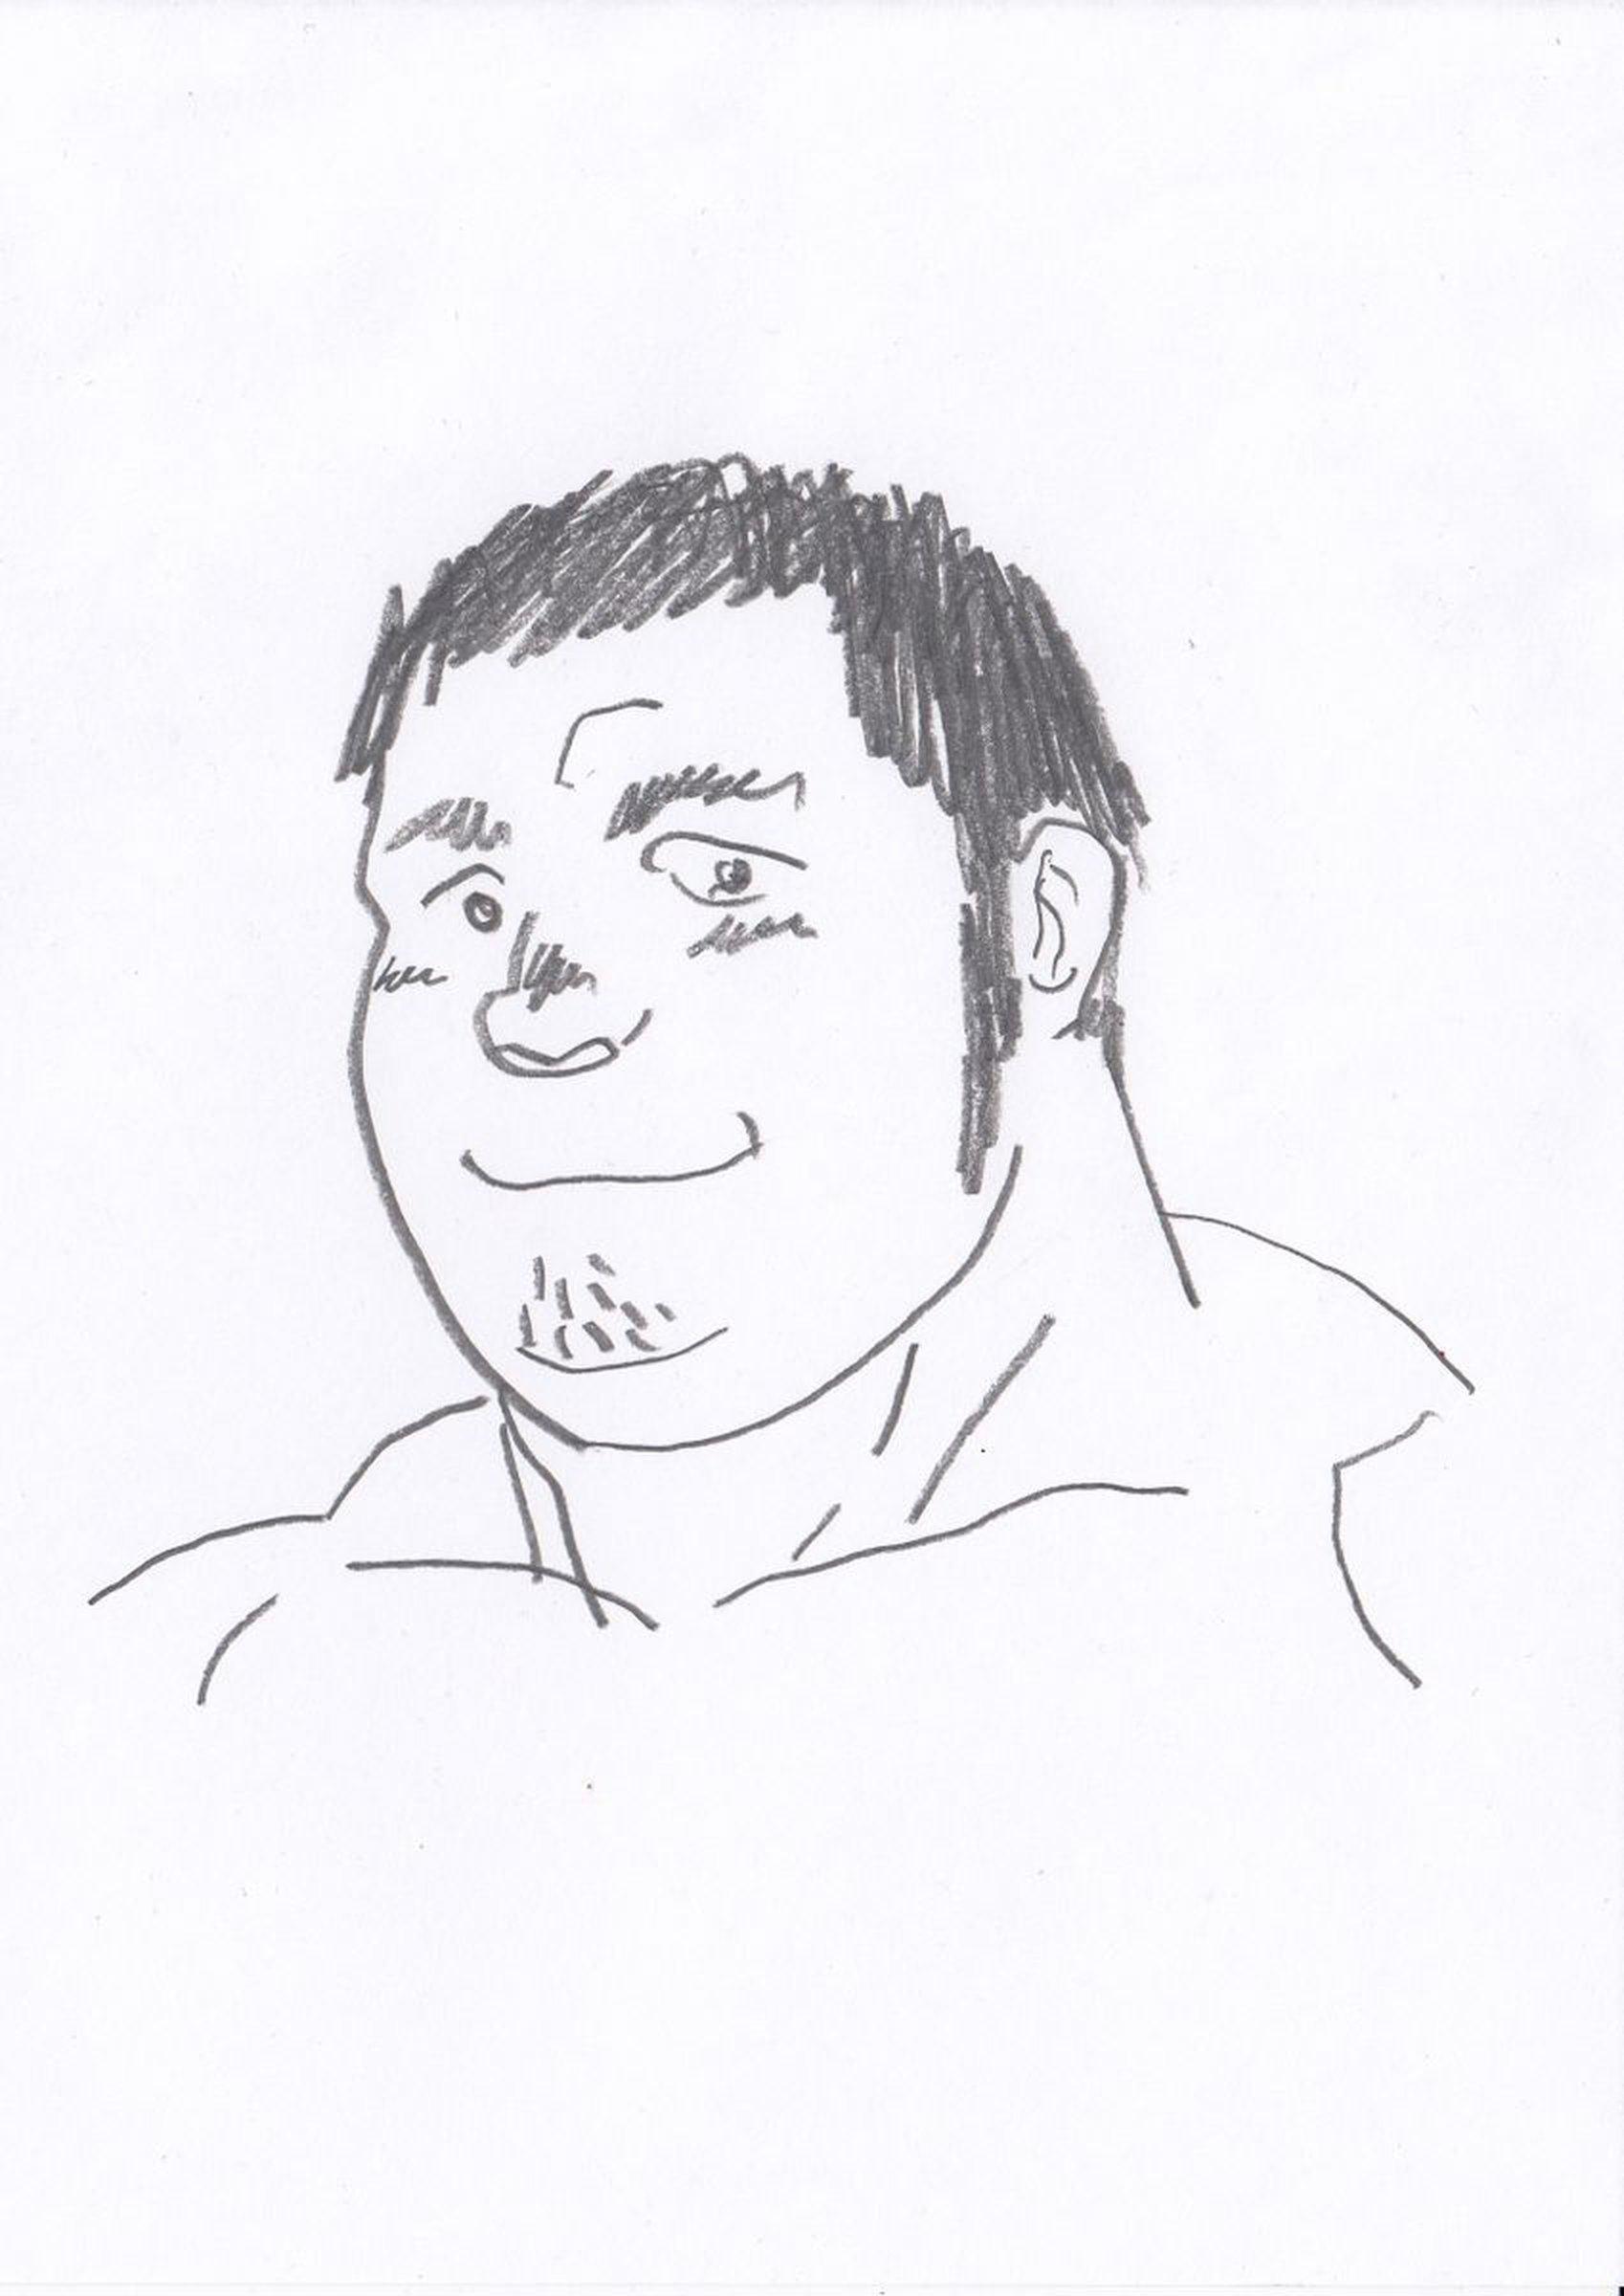 Anime drawing 3 2018